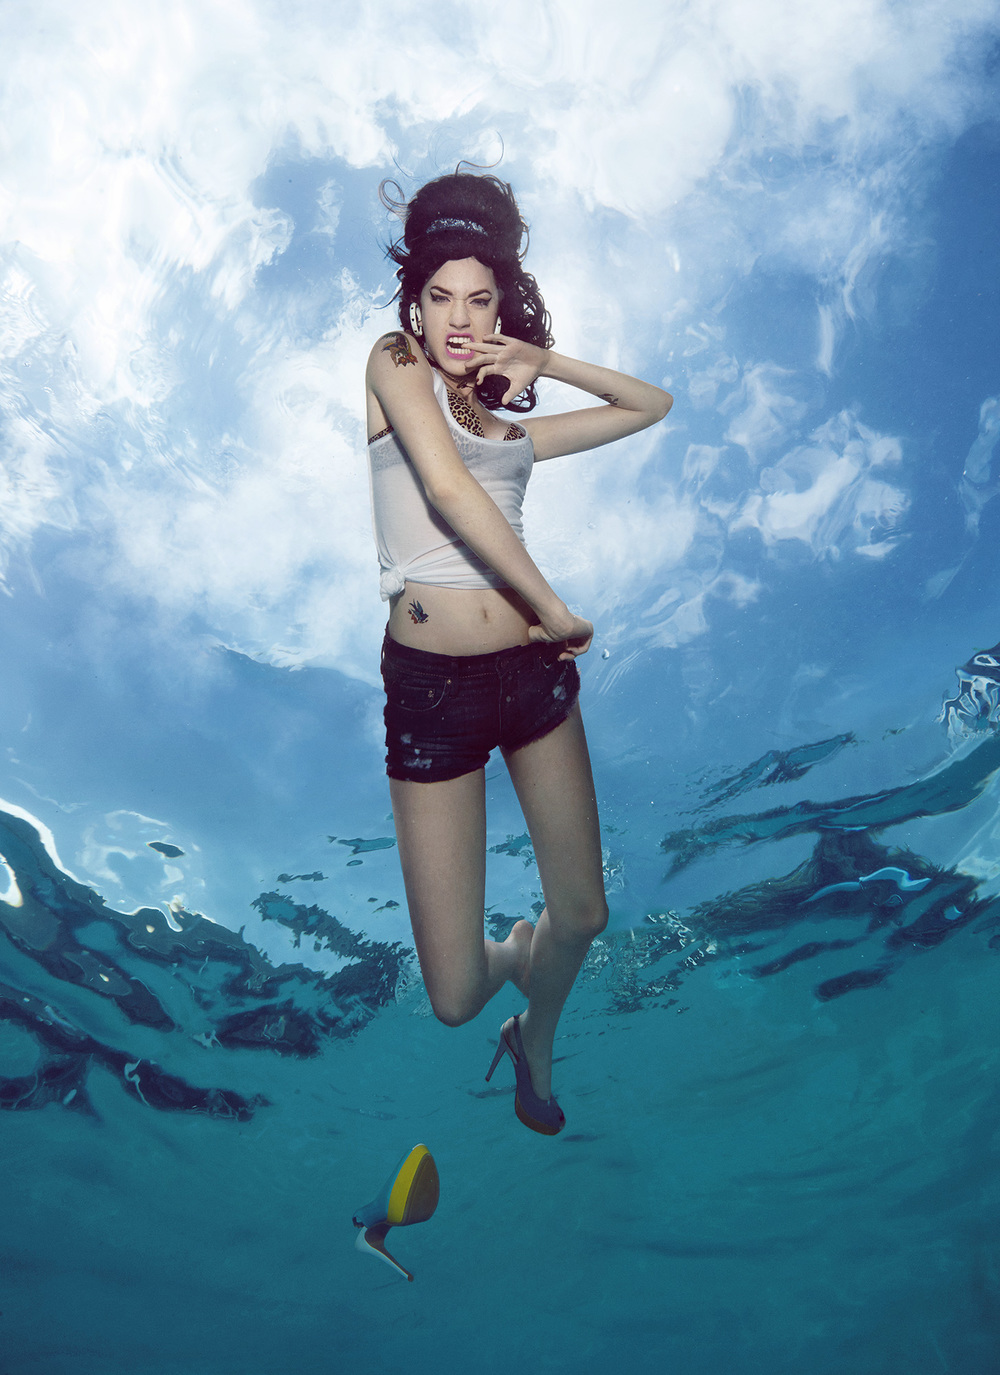 Underwater3_Shot03111_07.jpg